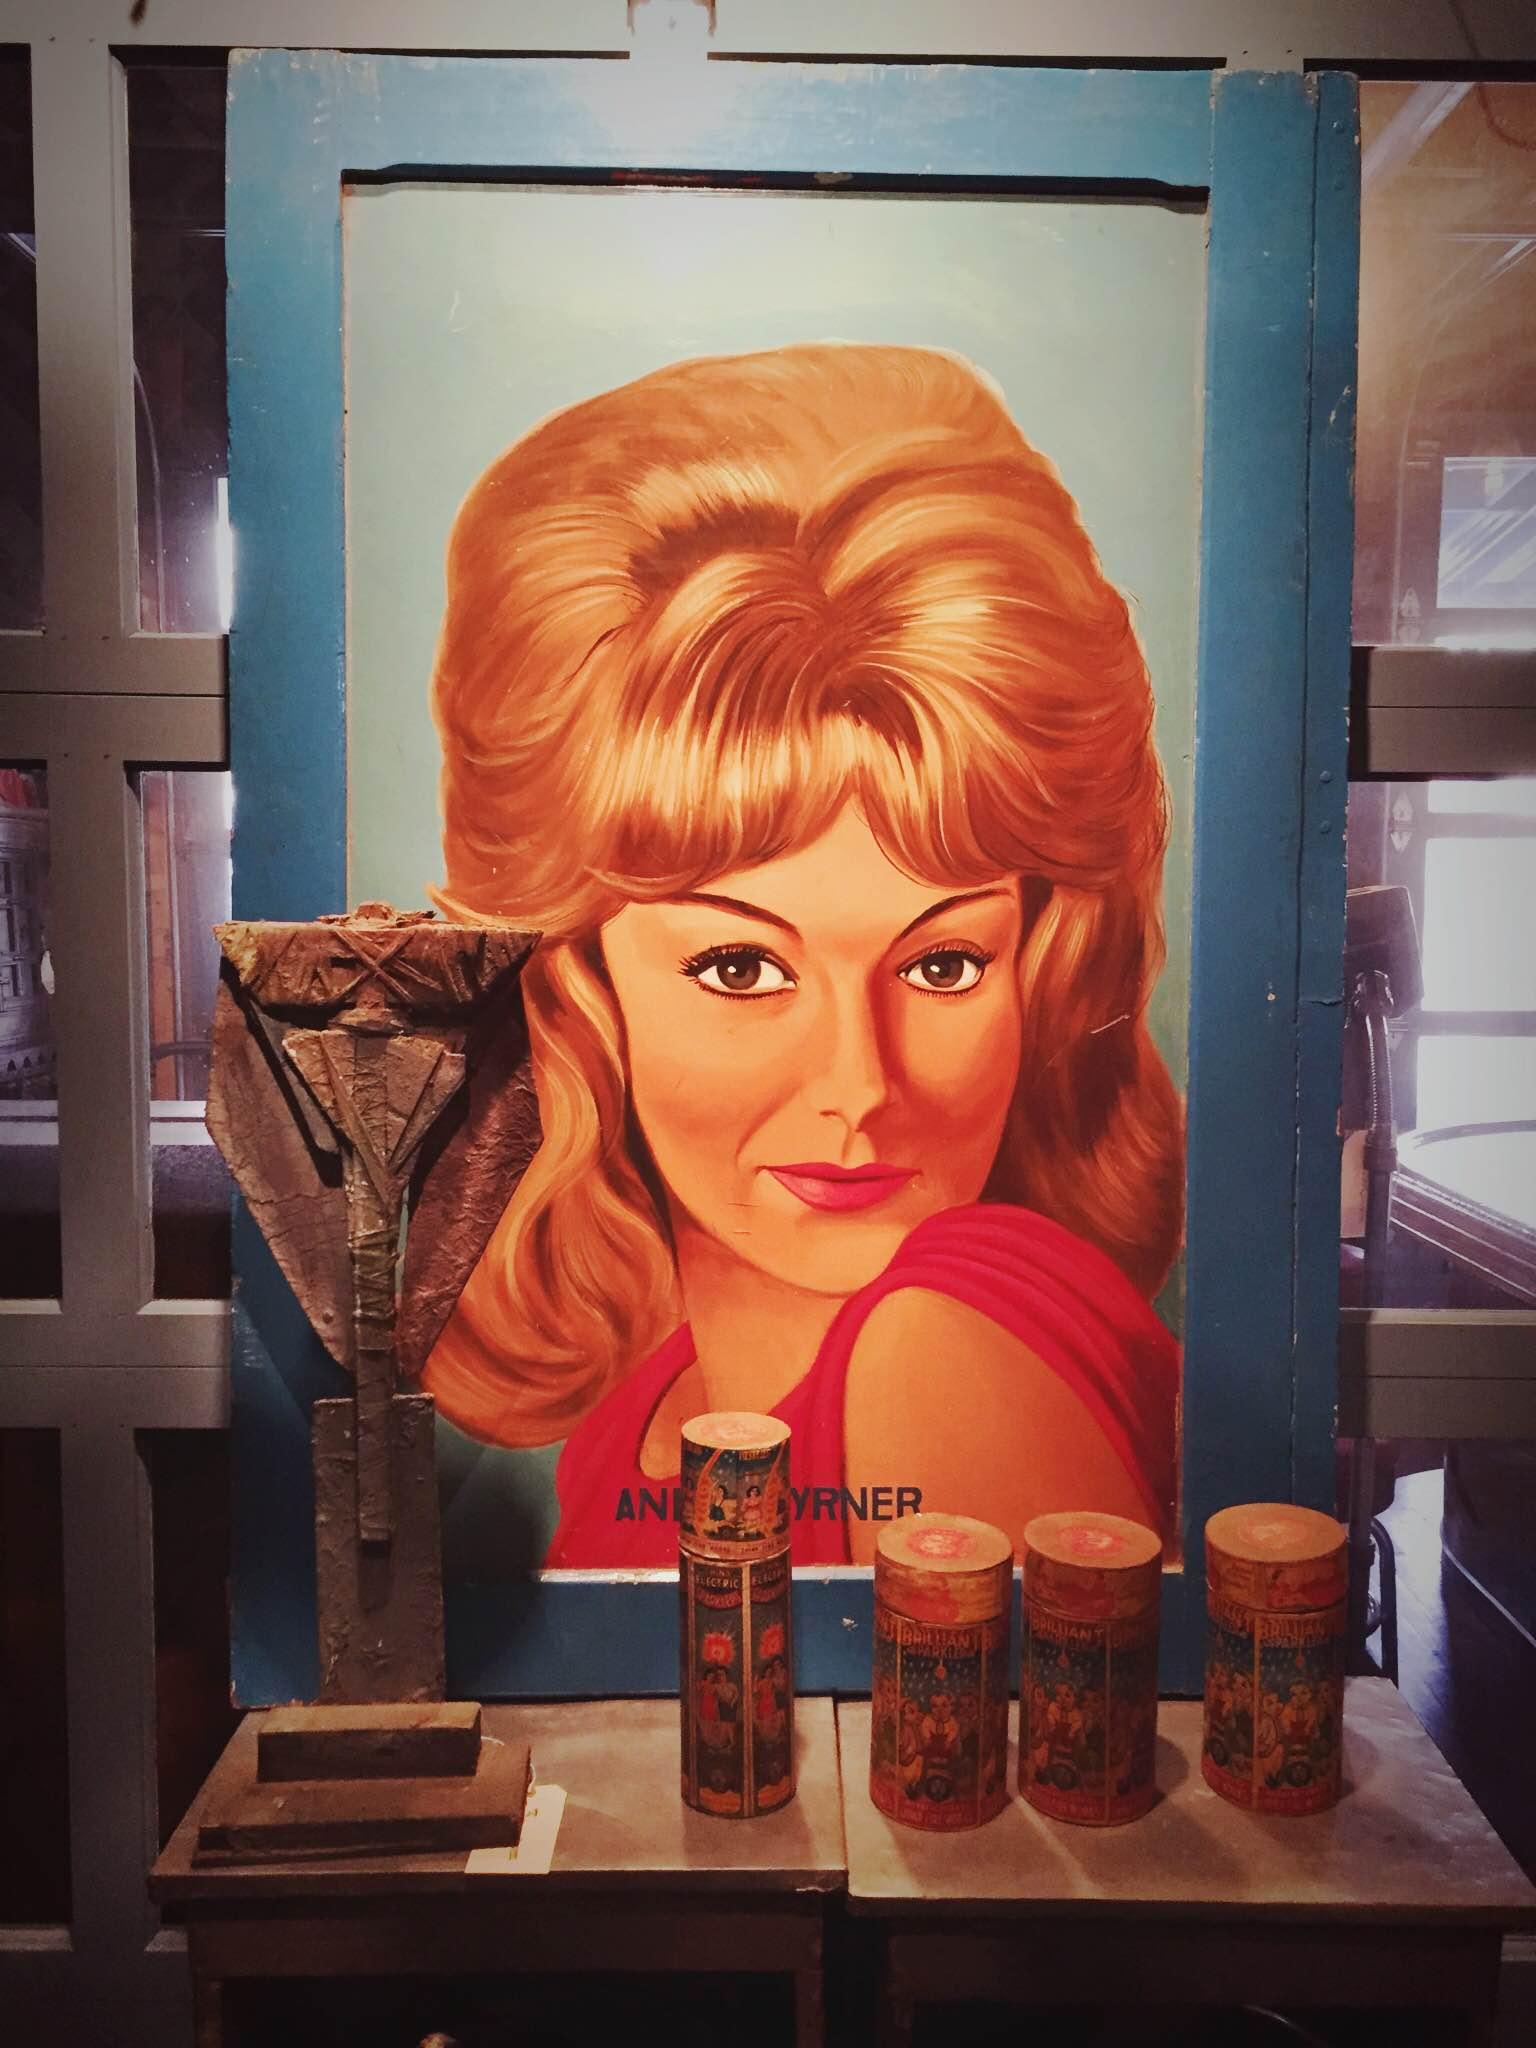 Antique shop in Hudson, NY | Freckle & Fair